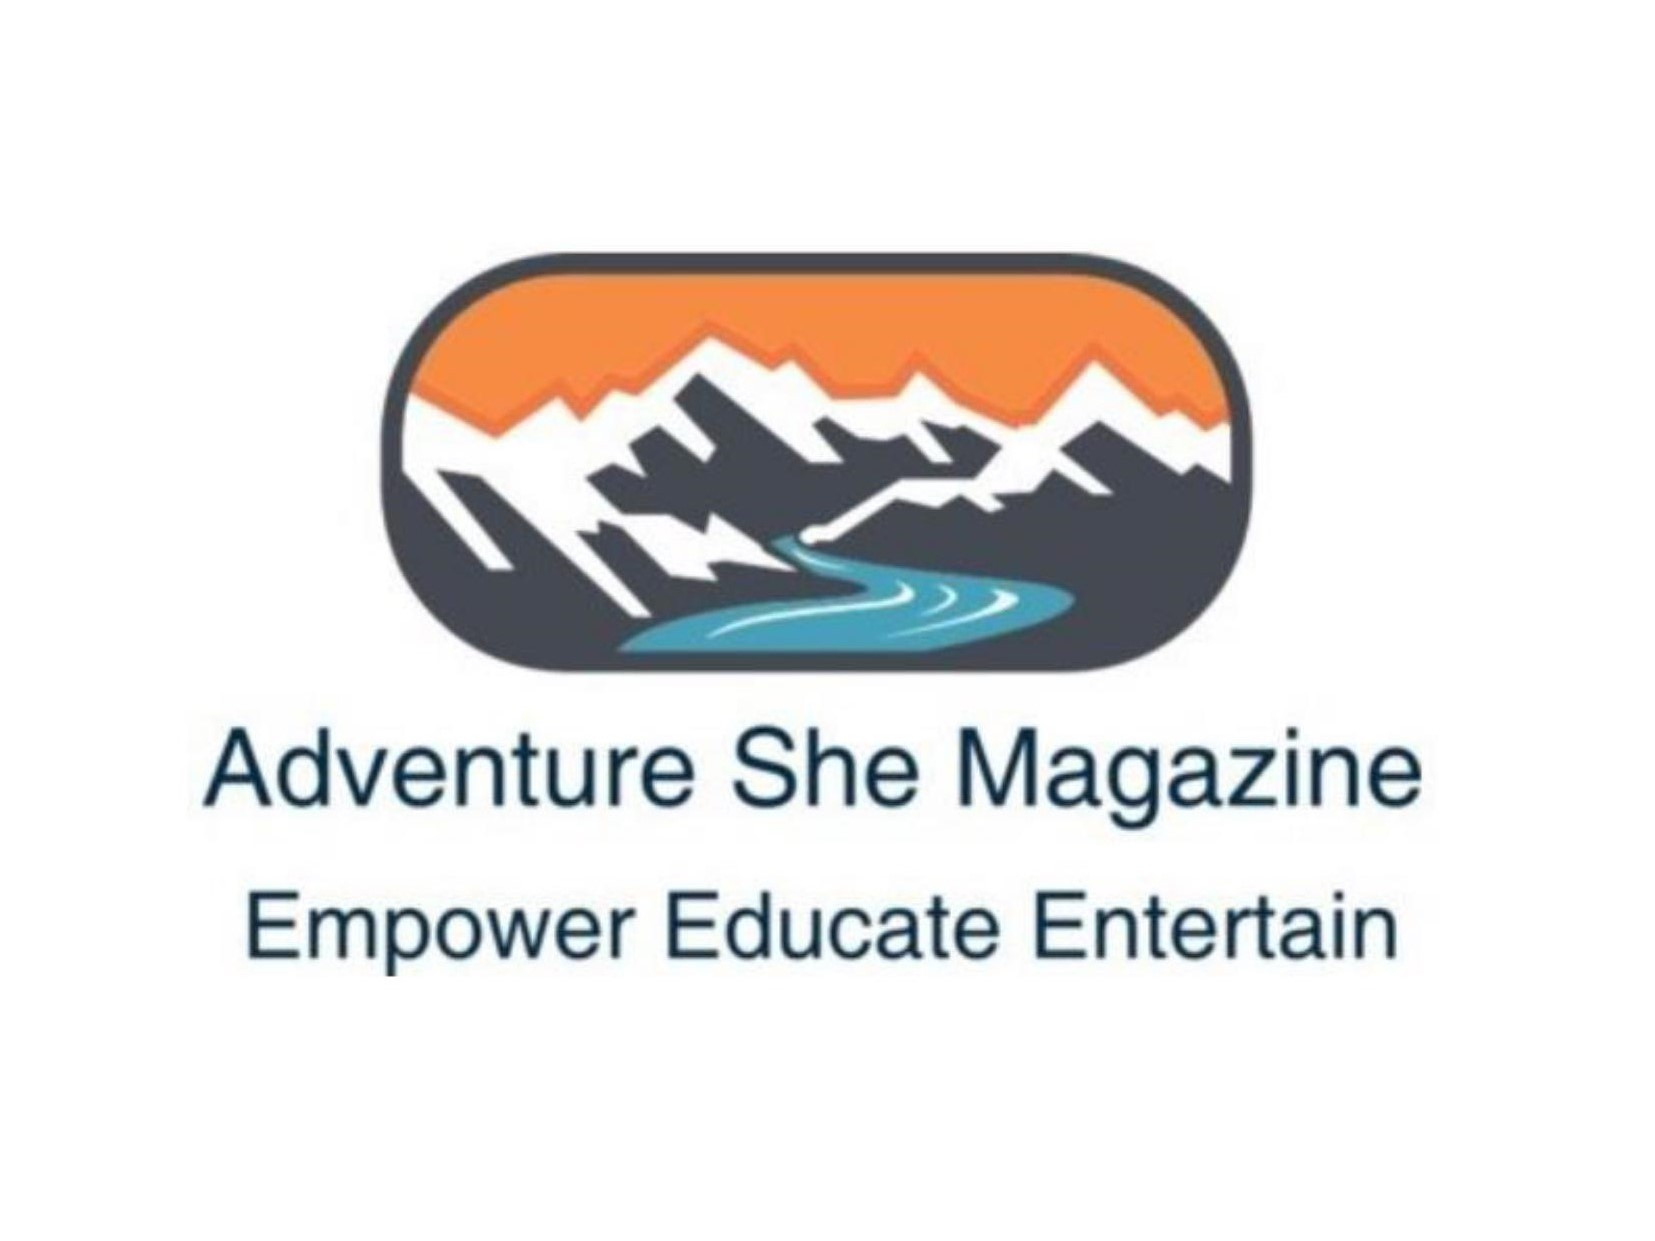 adventure she magazine